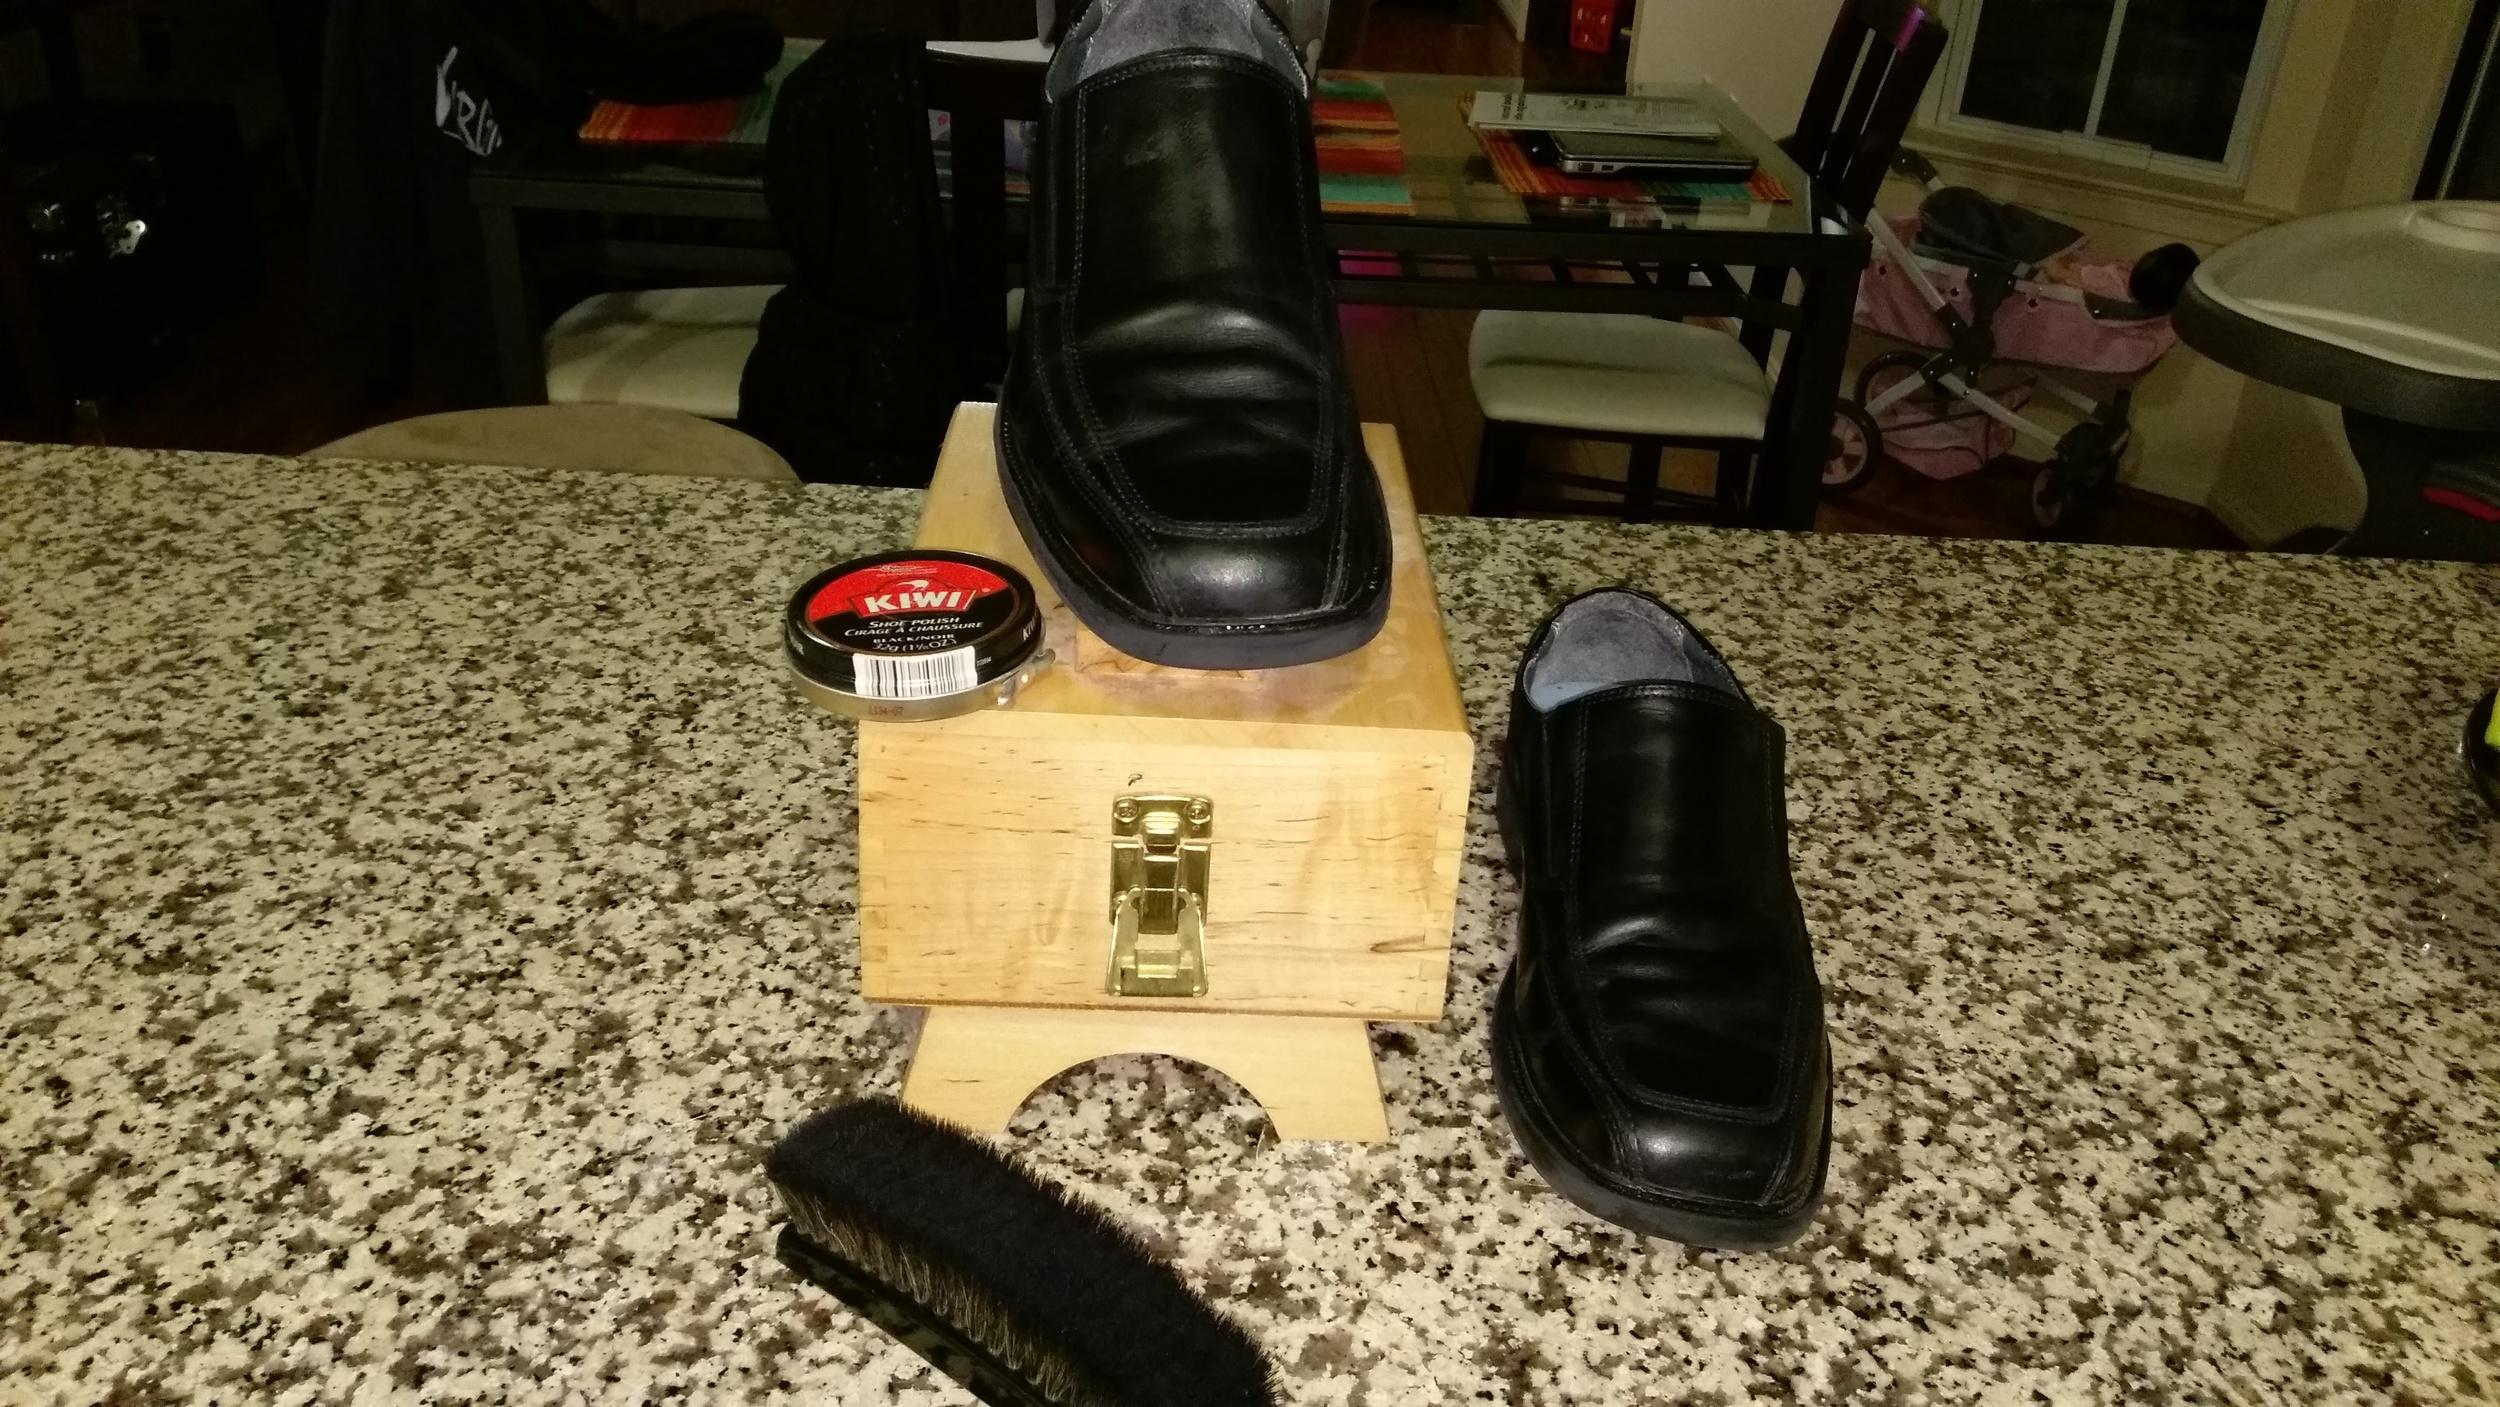 Pop was kind enough to leave me a shoe shine kit